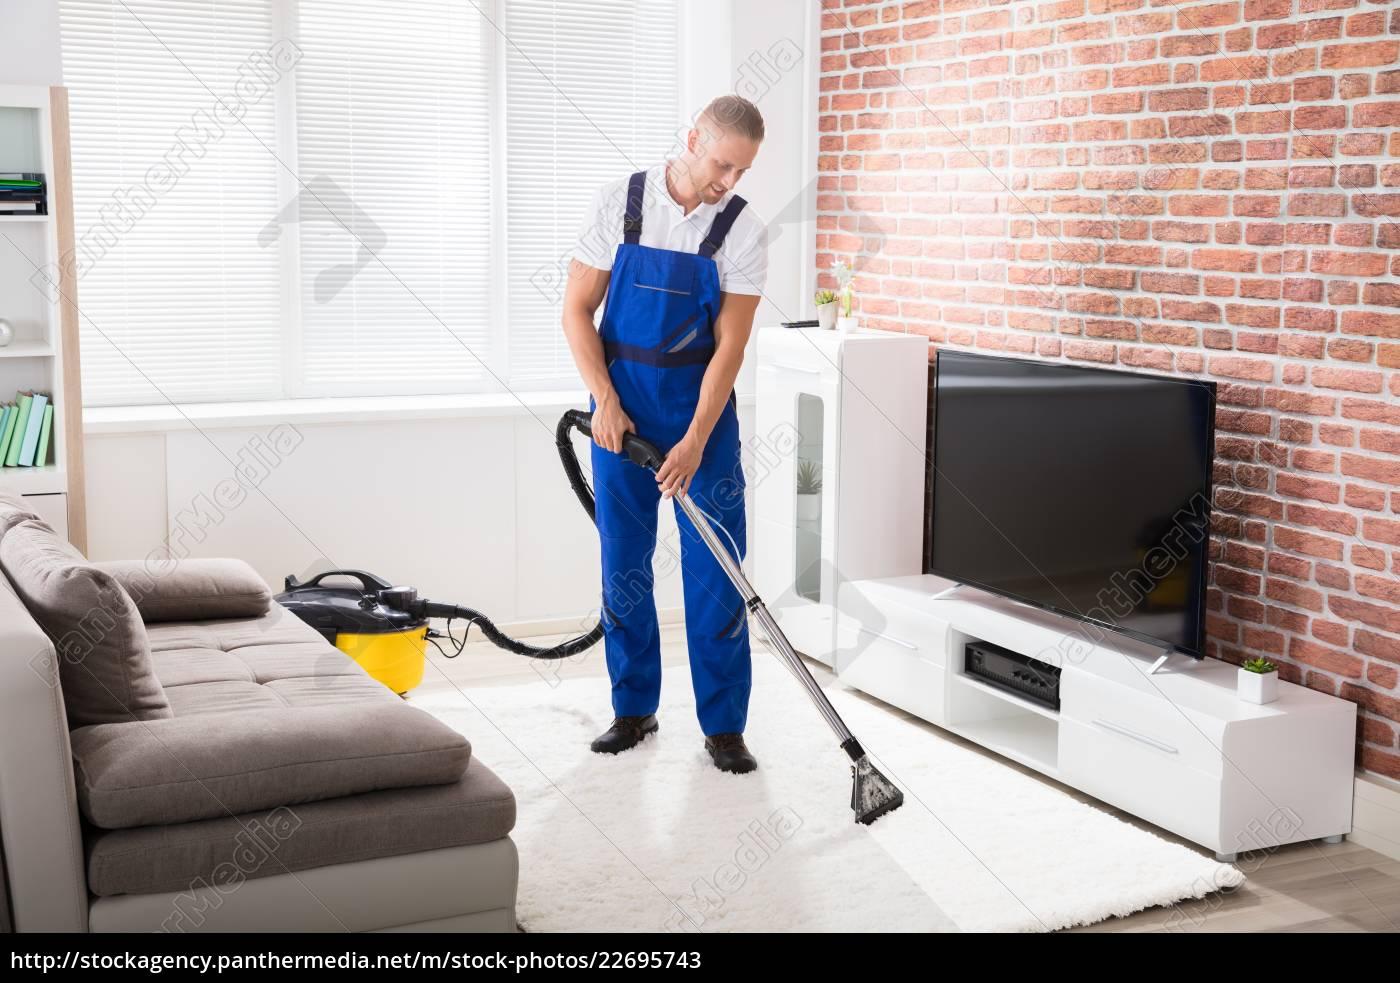 male, janitor, vacuuming, carpet - 22695743